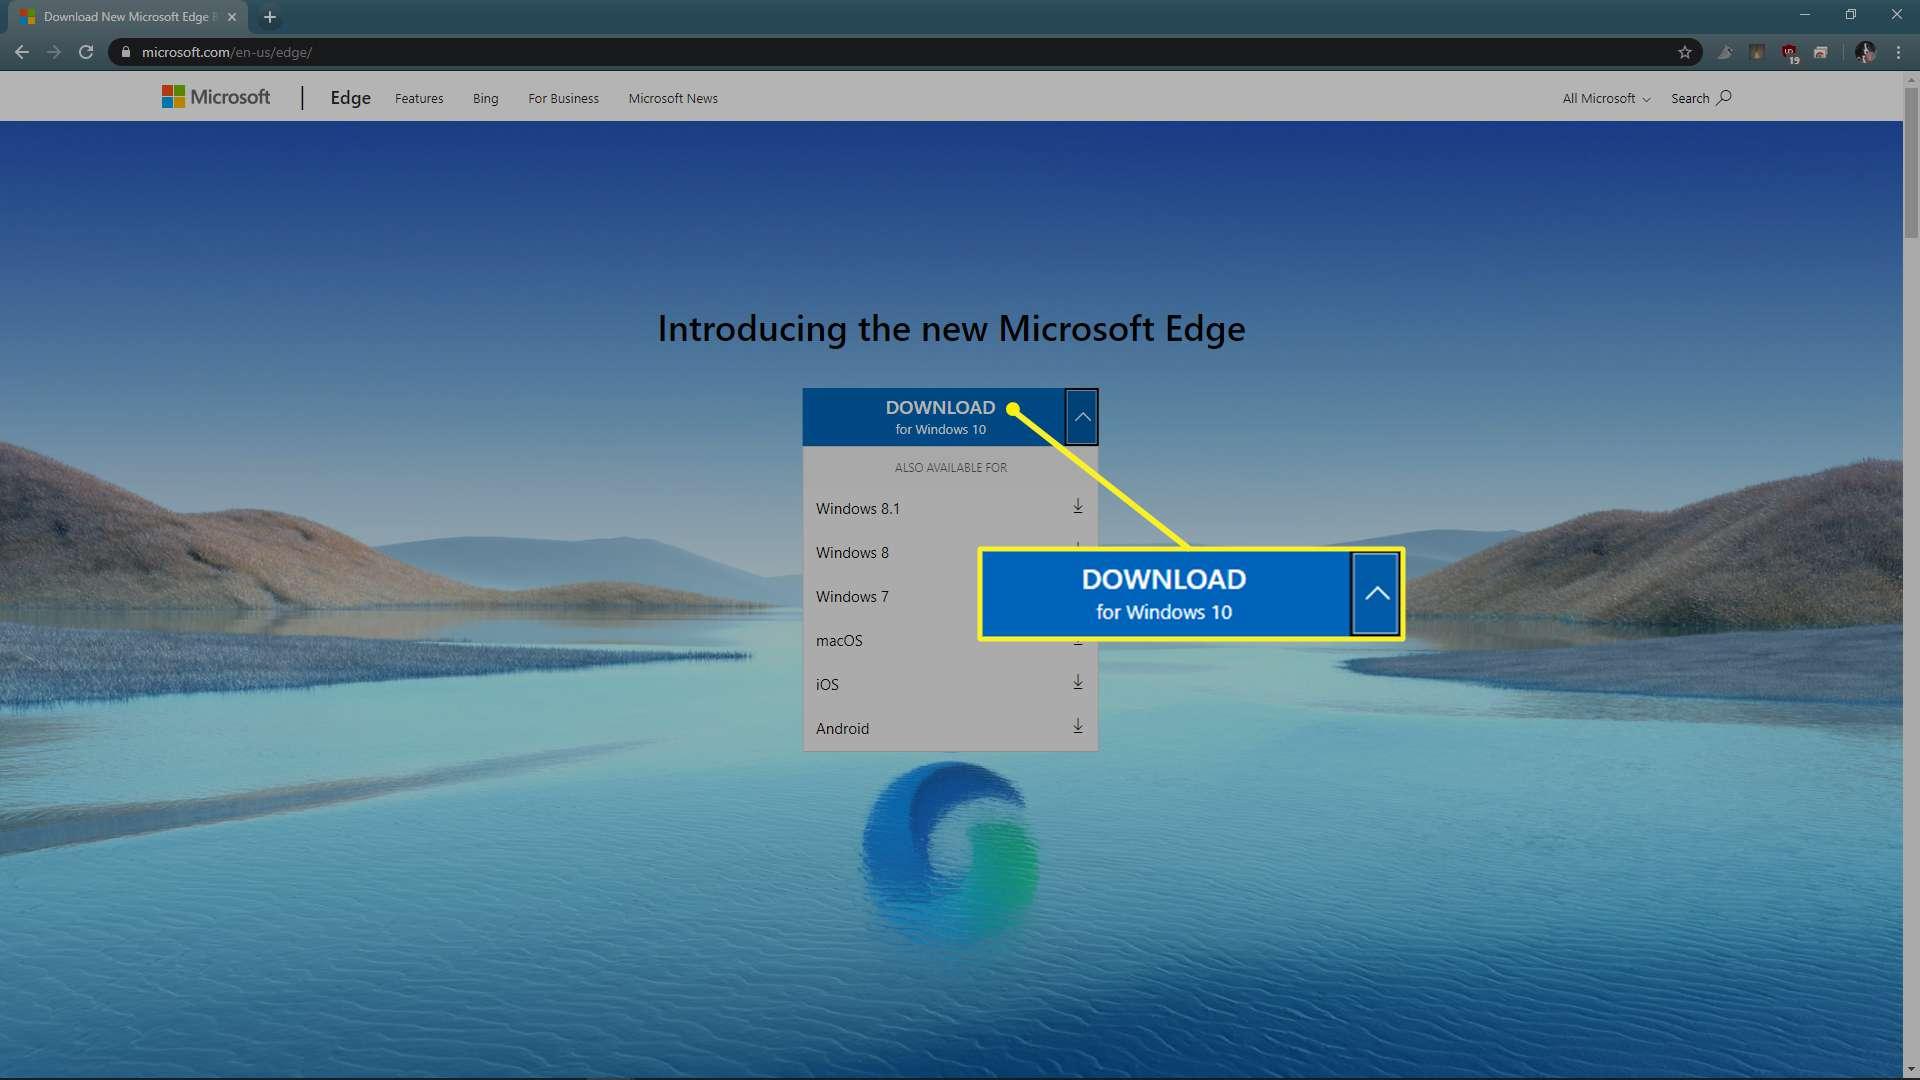 Chromium Edge available versions